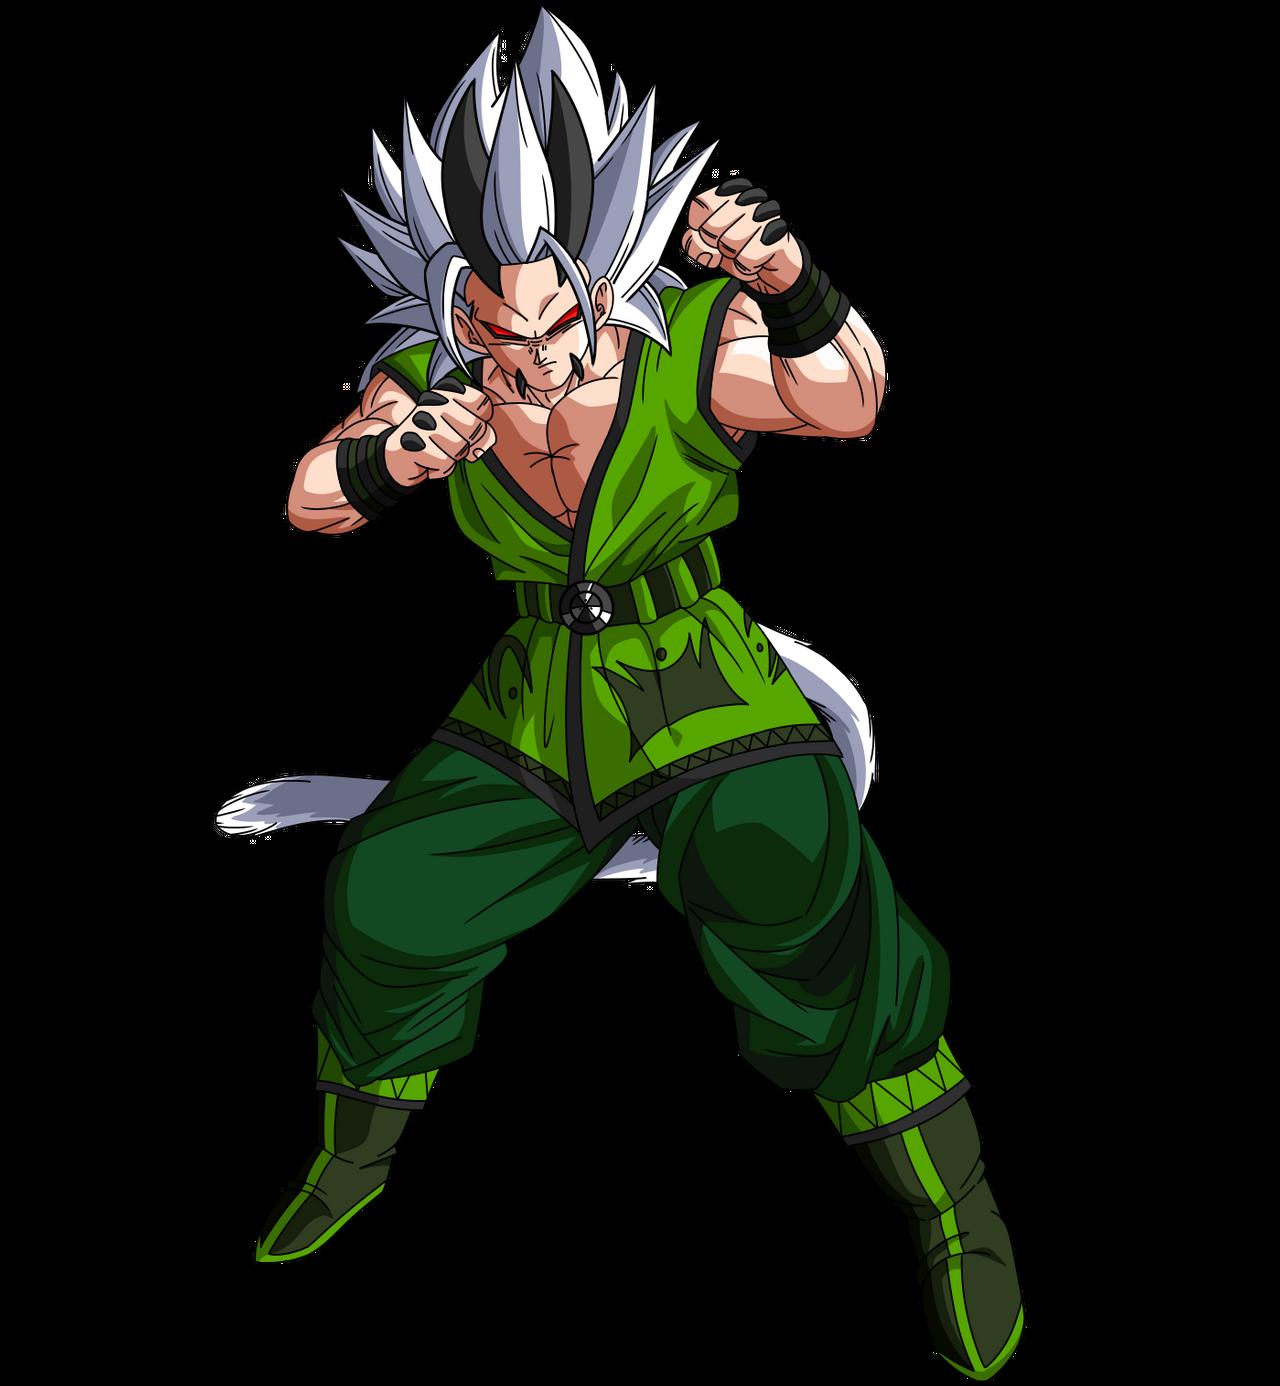 Goku Super Saiyan 9 Full Power By Ivansalina On Deviantart Goku Super Goku Super Saiyan Dragon Ball Super Manga